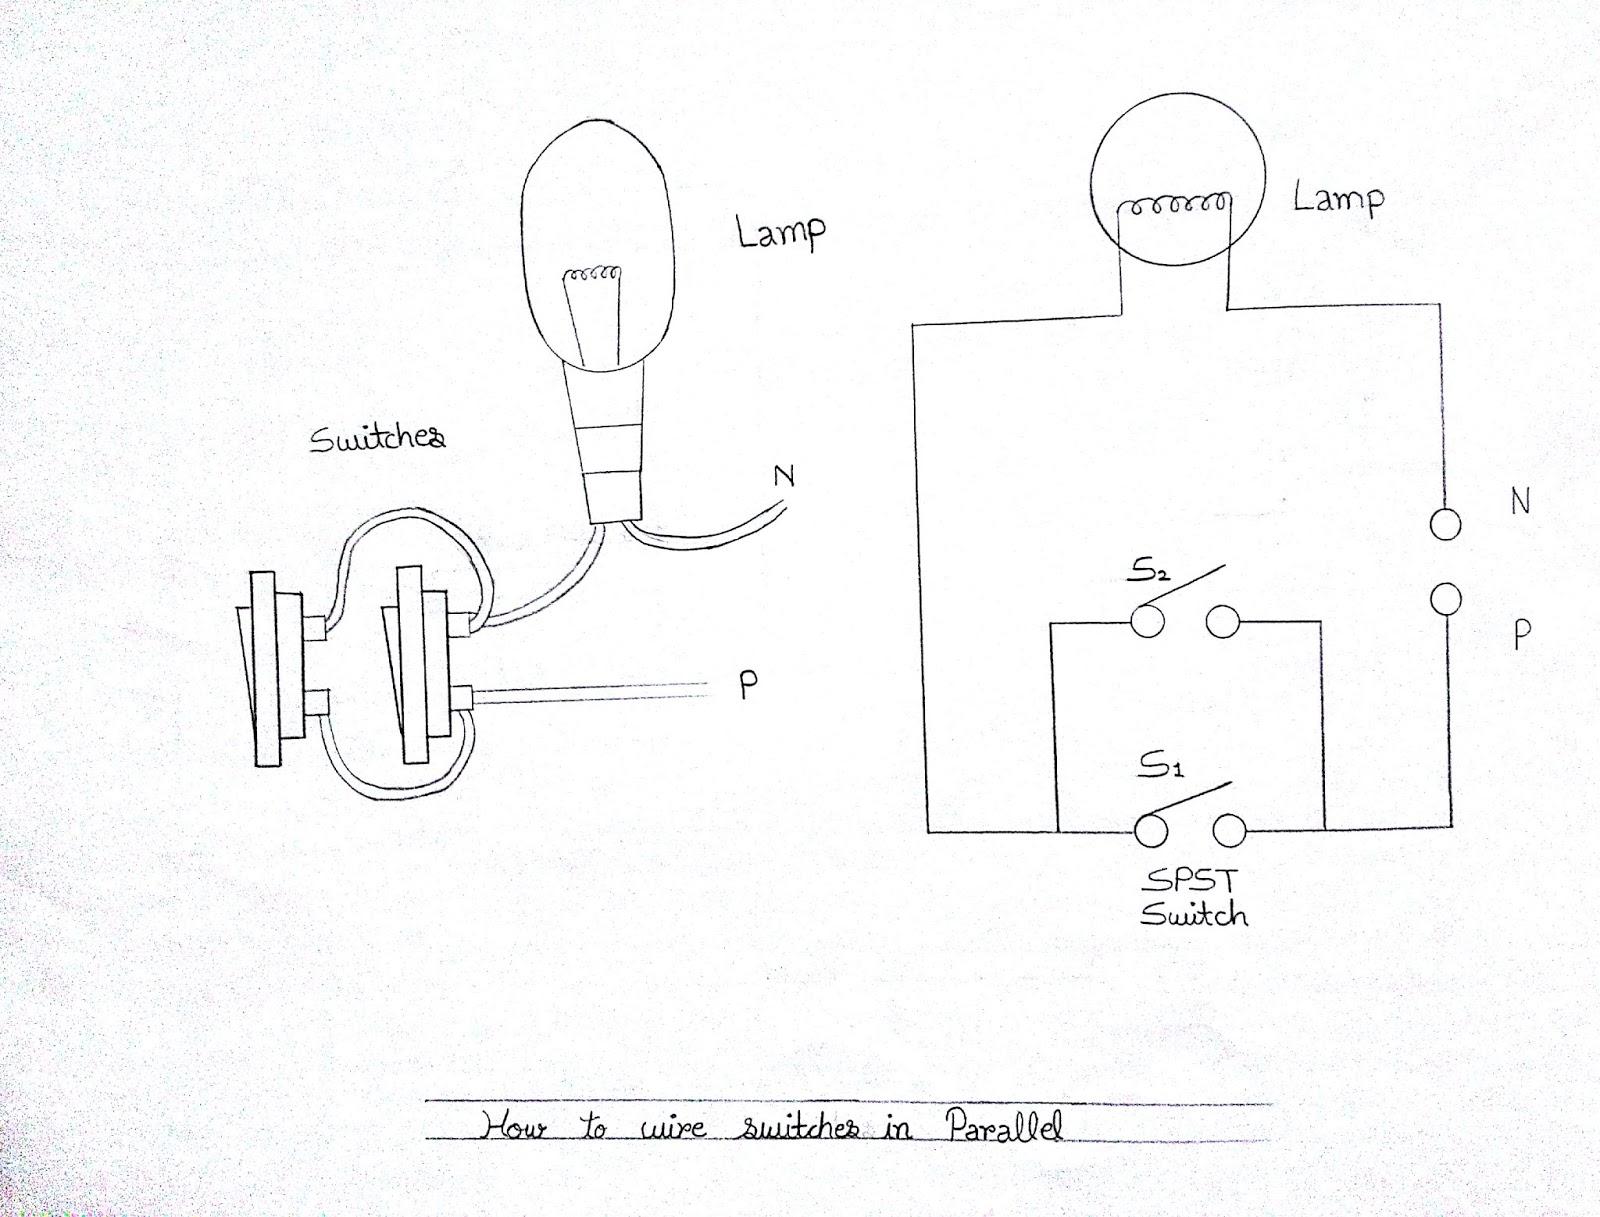 medium resolution of 5 pin wall socket connection diagram